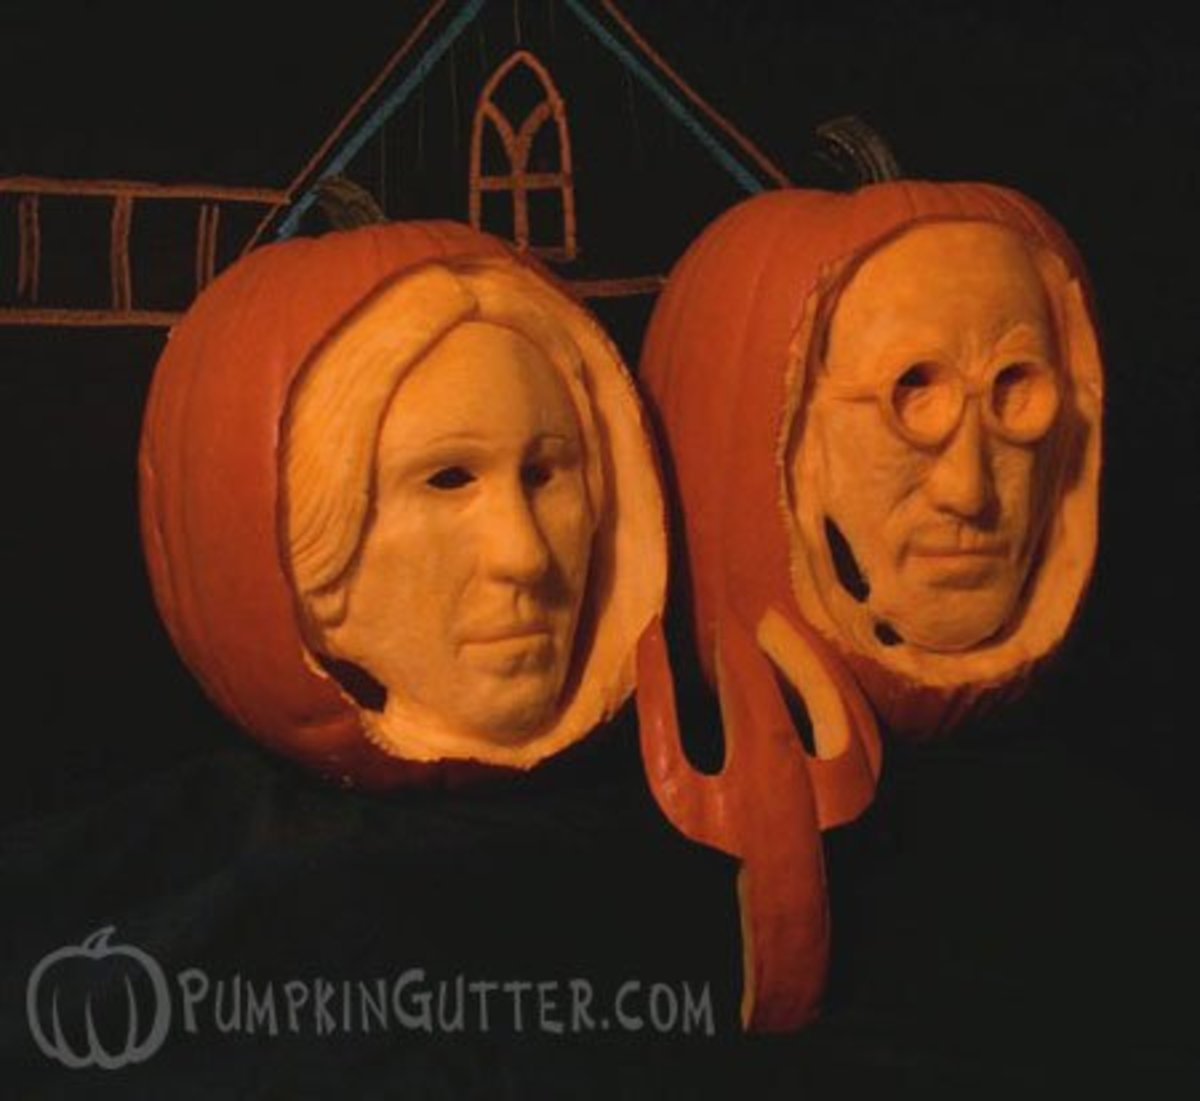 American Gothic pumpkin